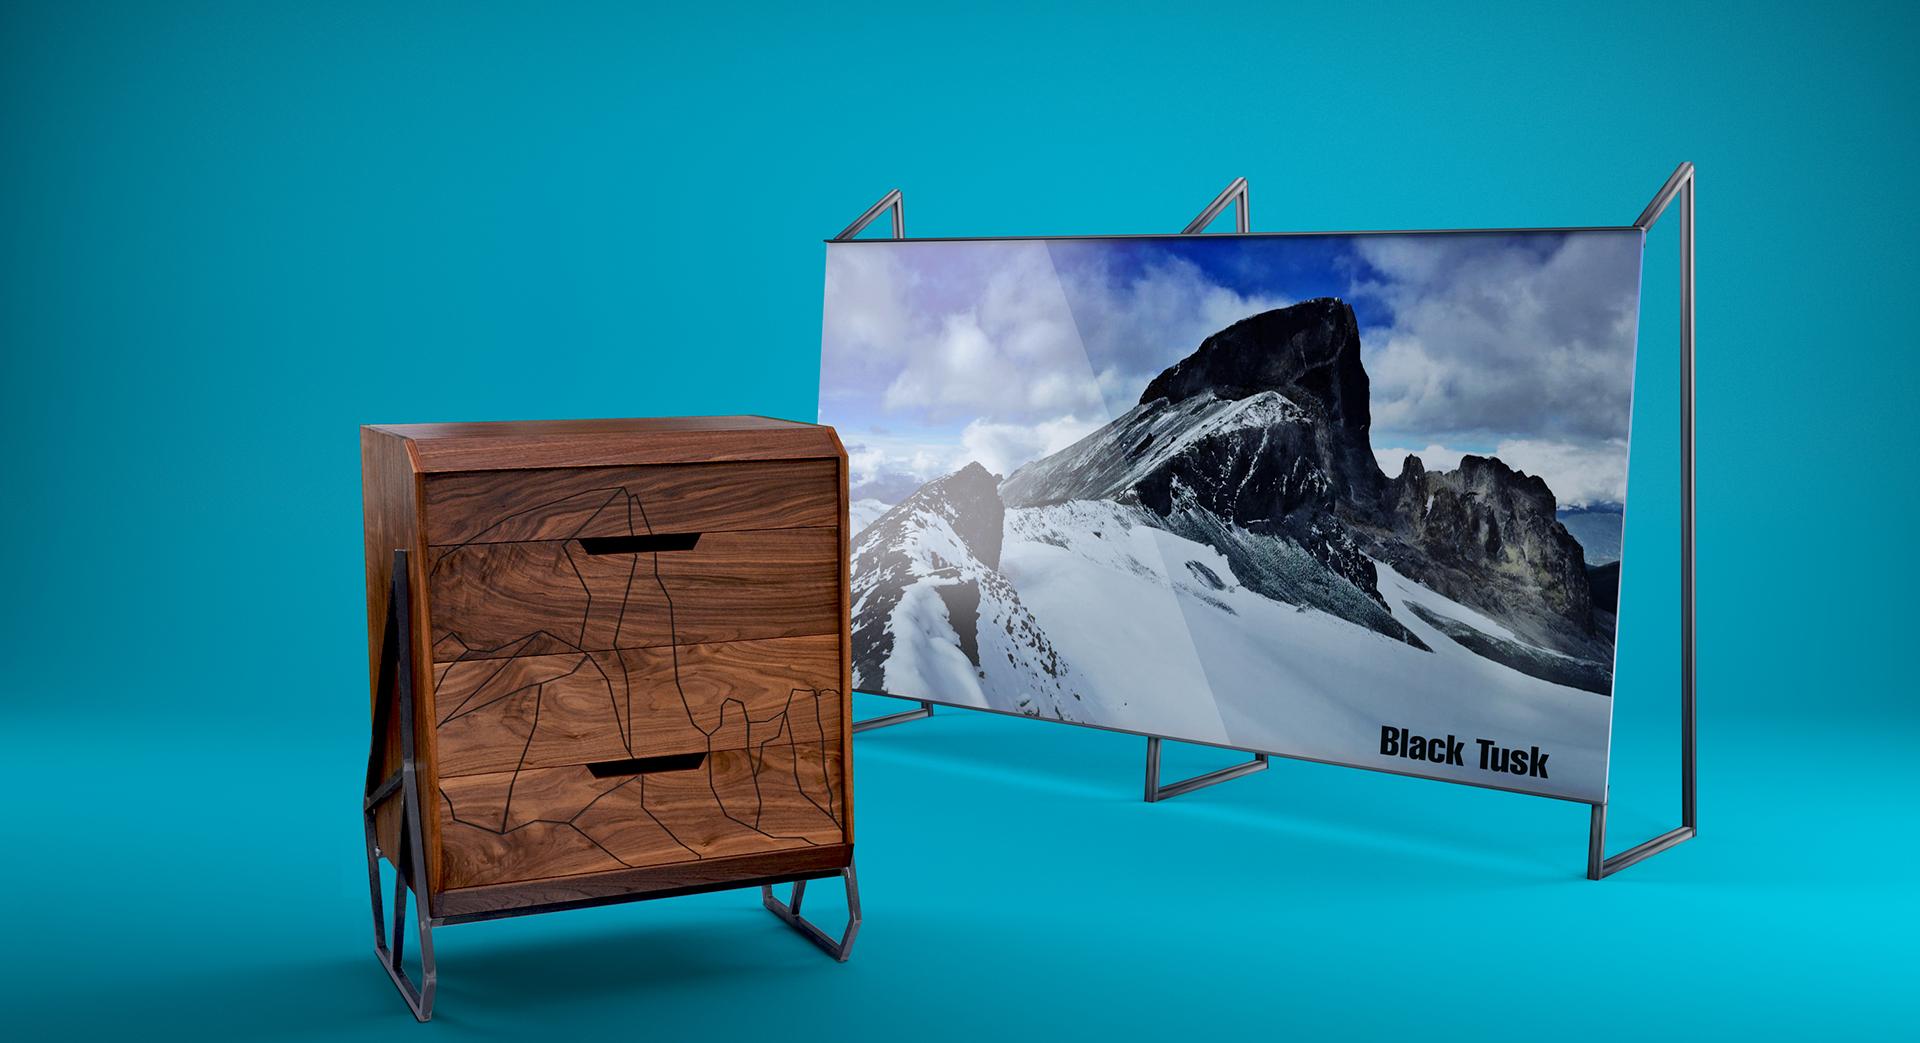 D'onis dresser 2- custom made by Arostegui Studio